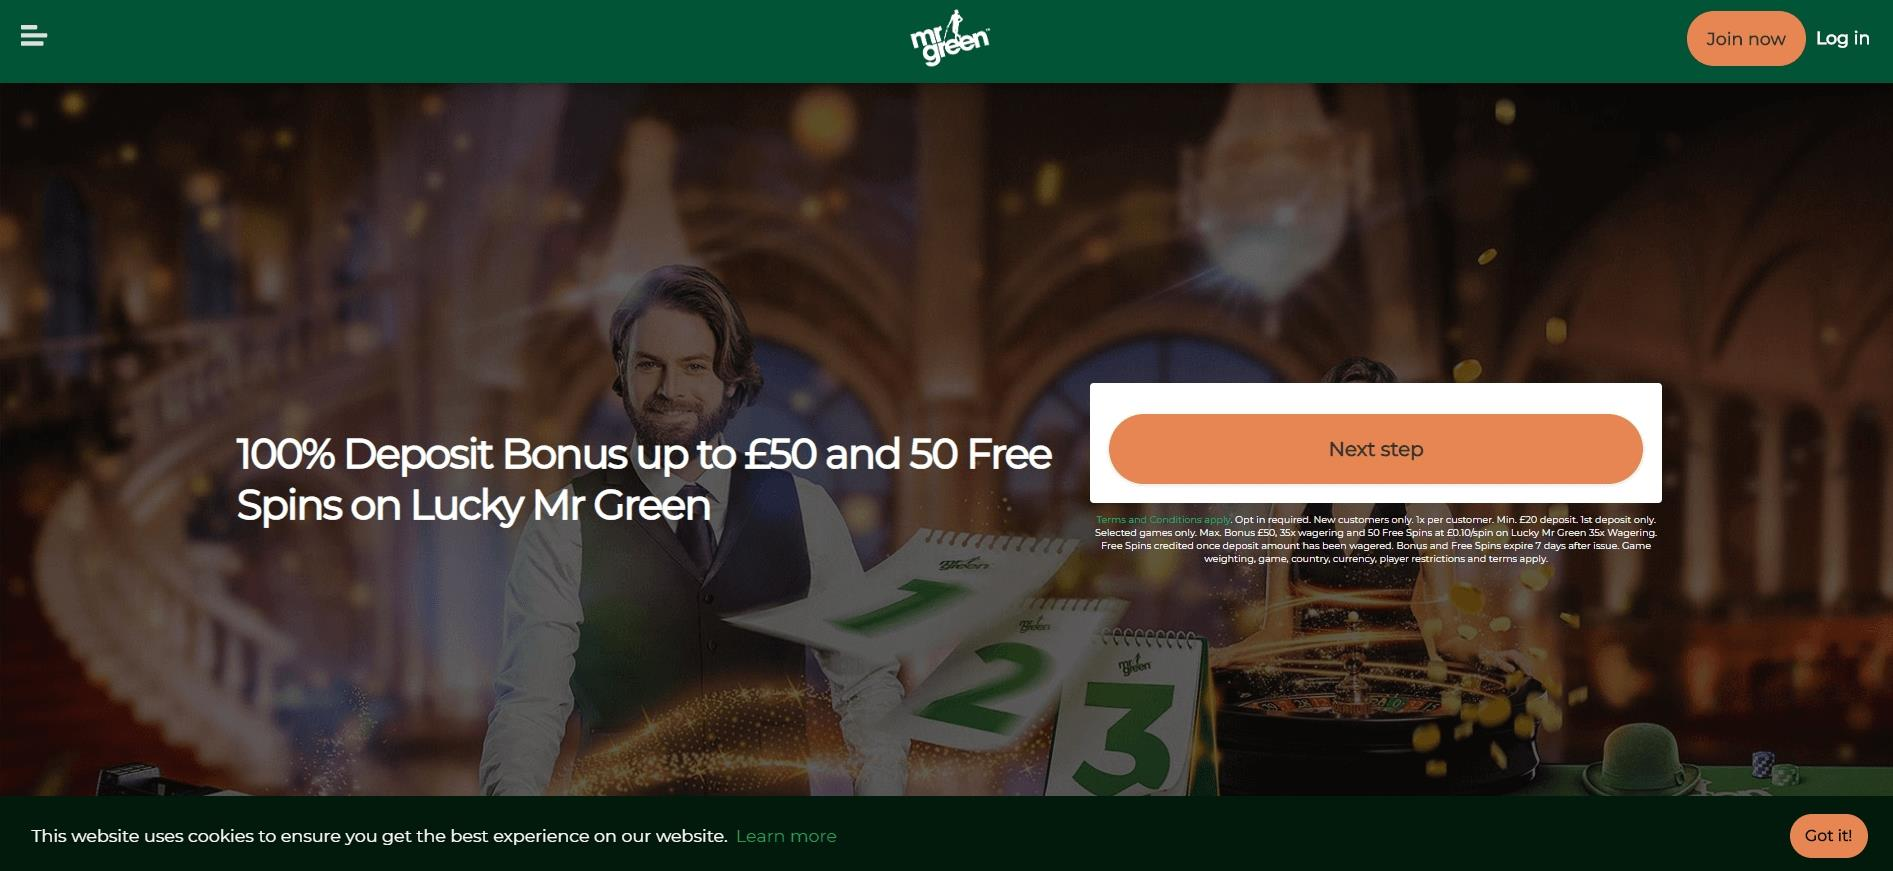 Mr Green banner showing 100% Deposit Bonus and Promotion Info